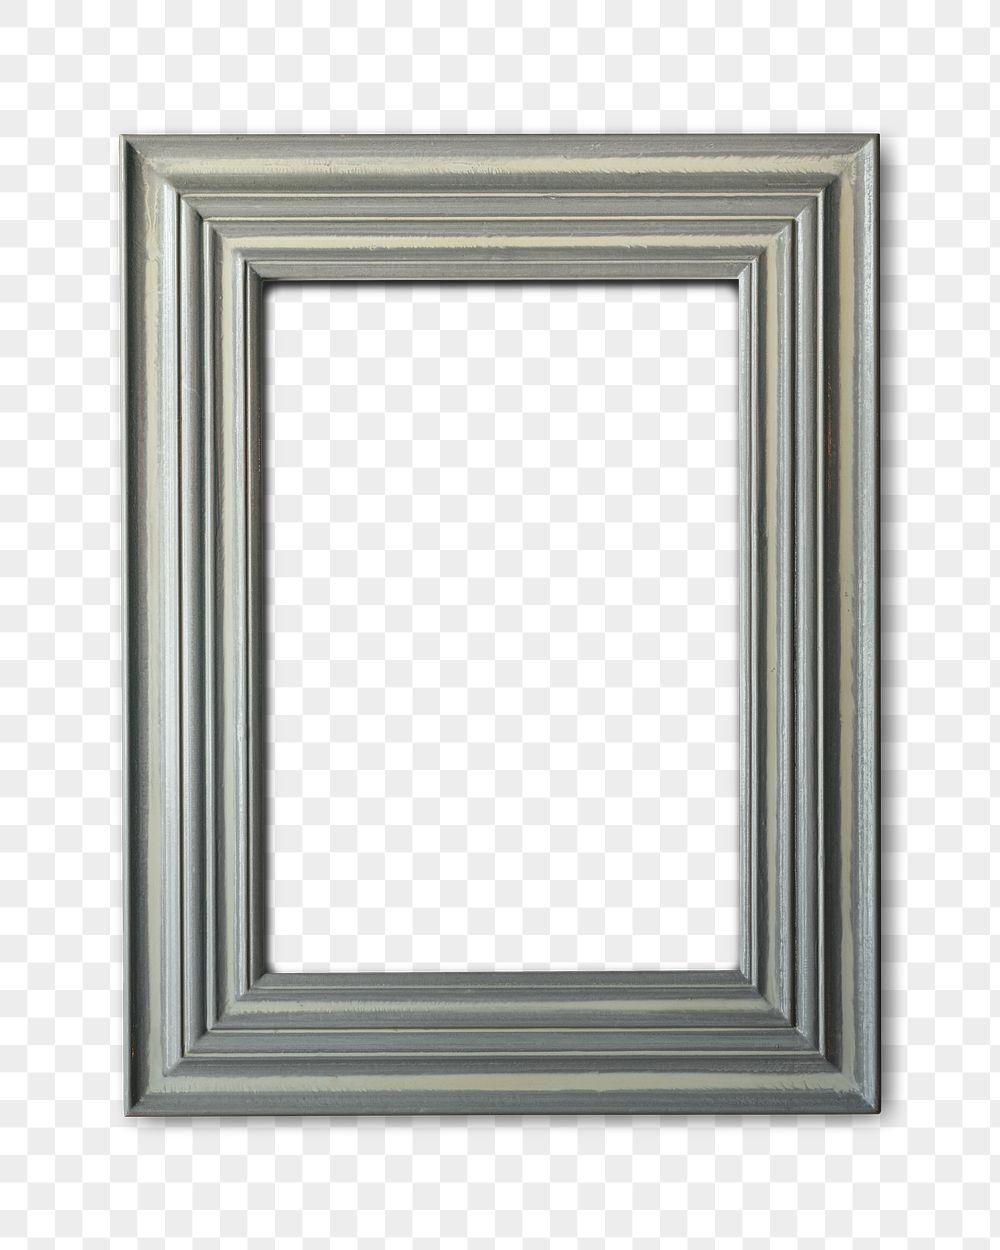 Gray picture frame mockup transparent png